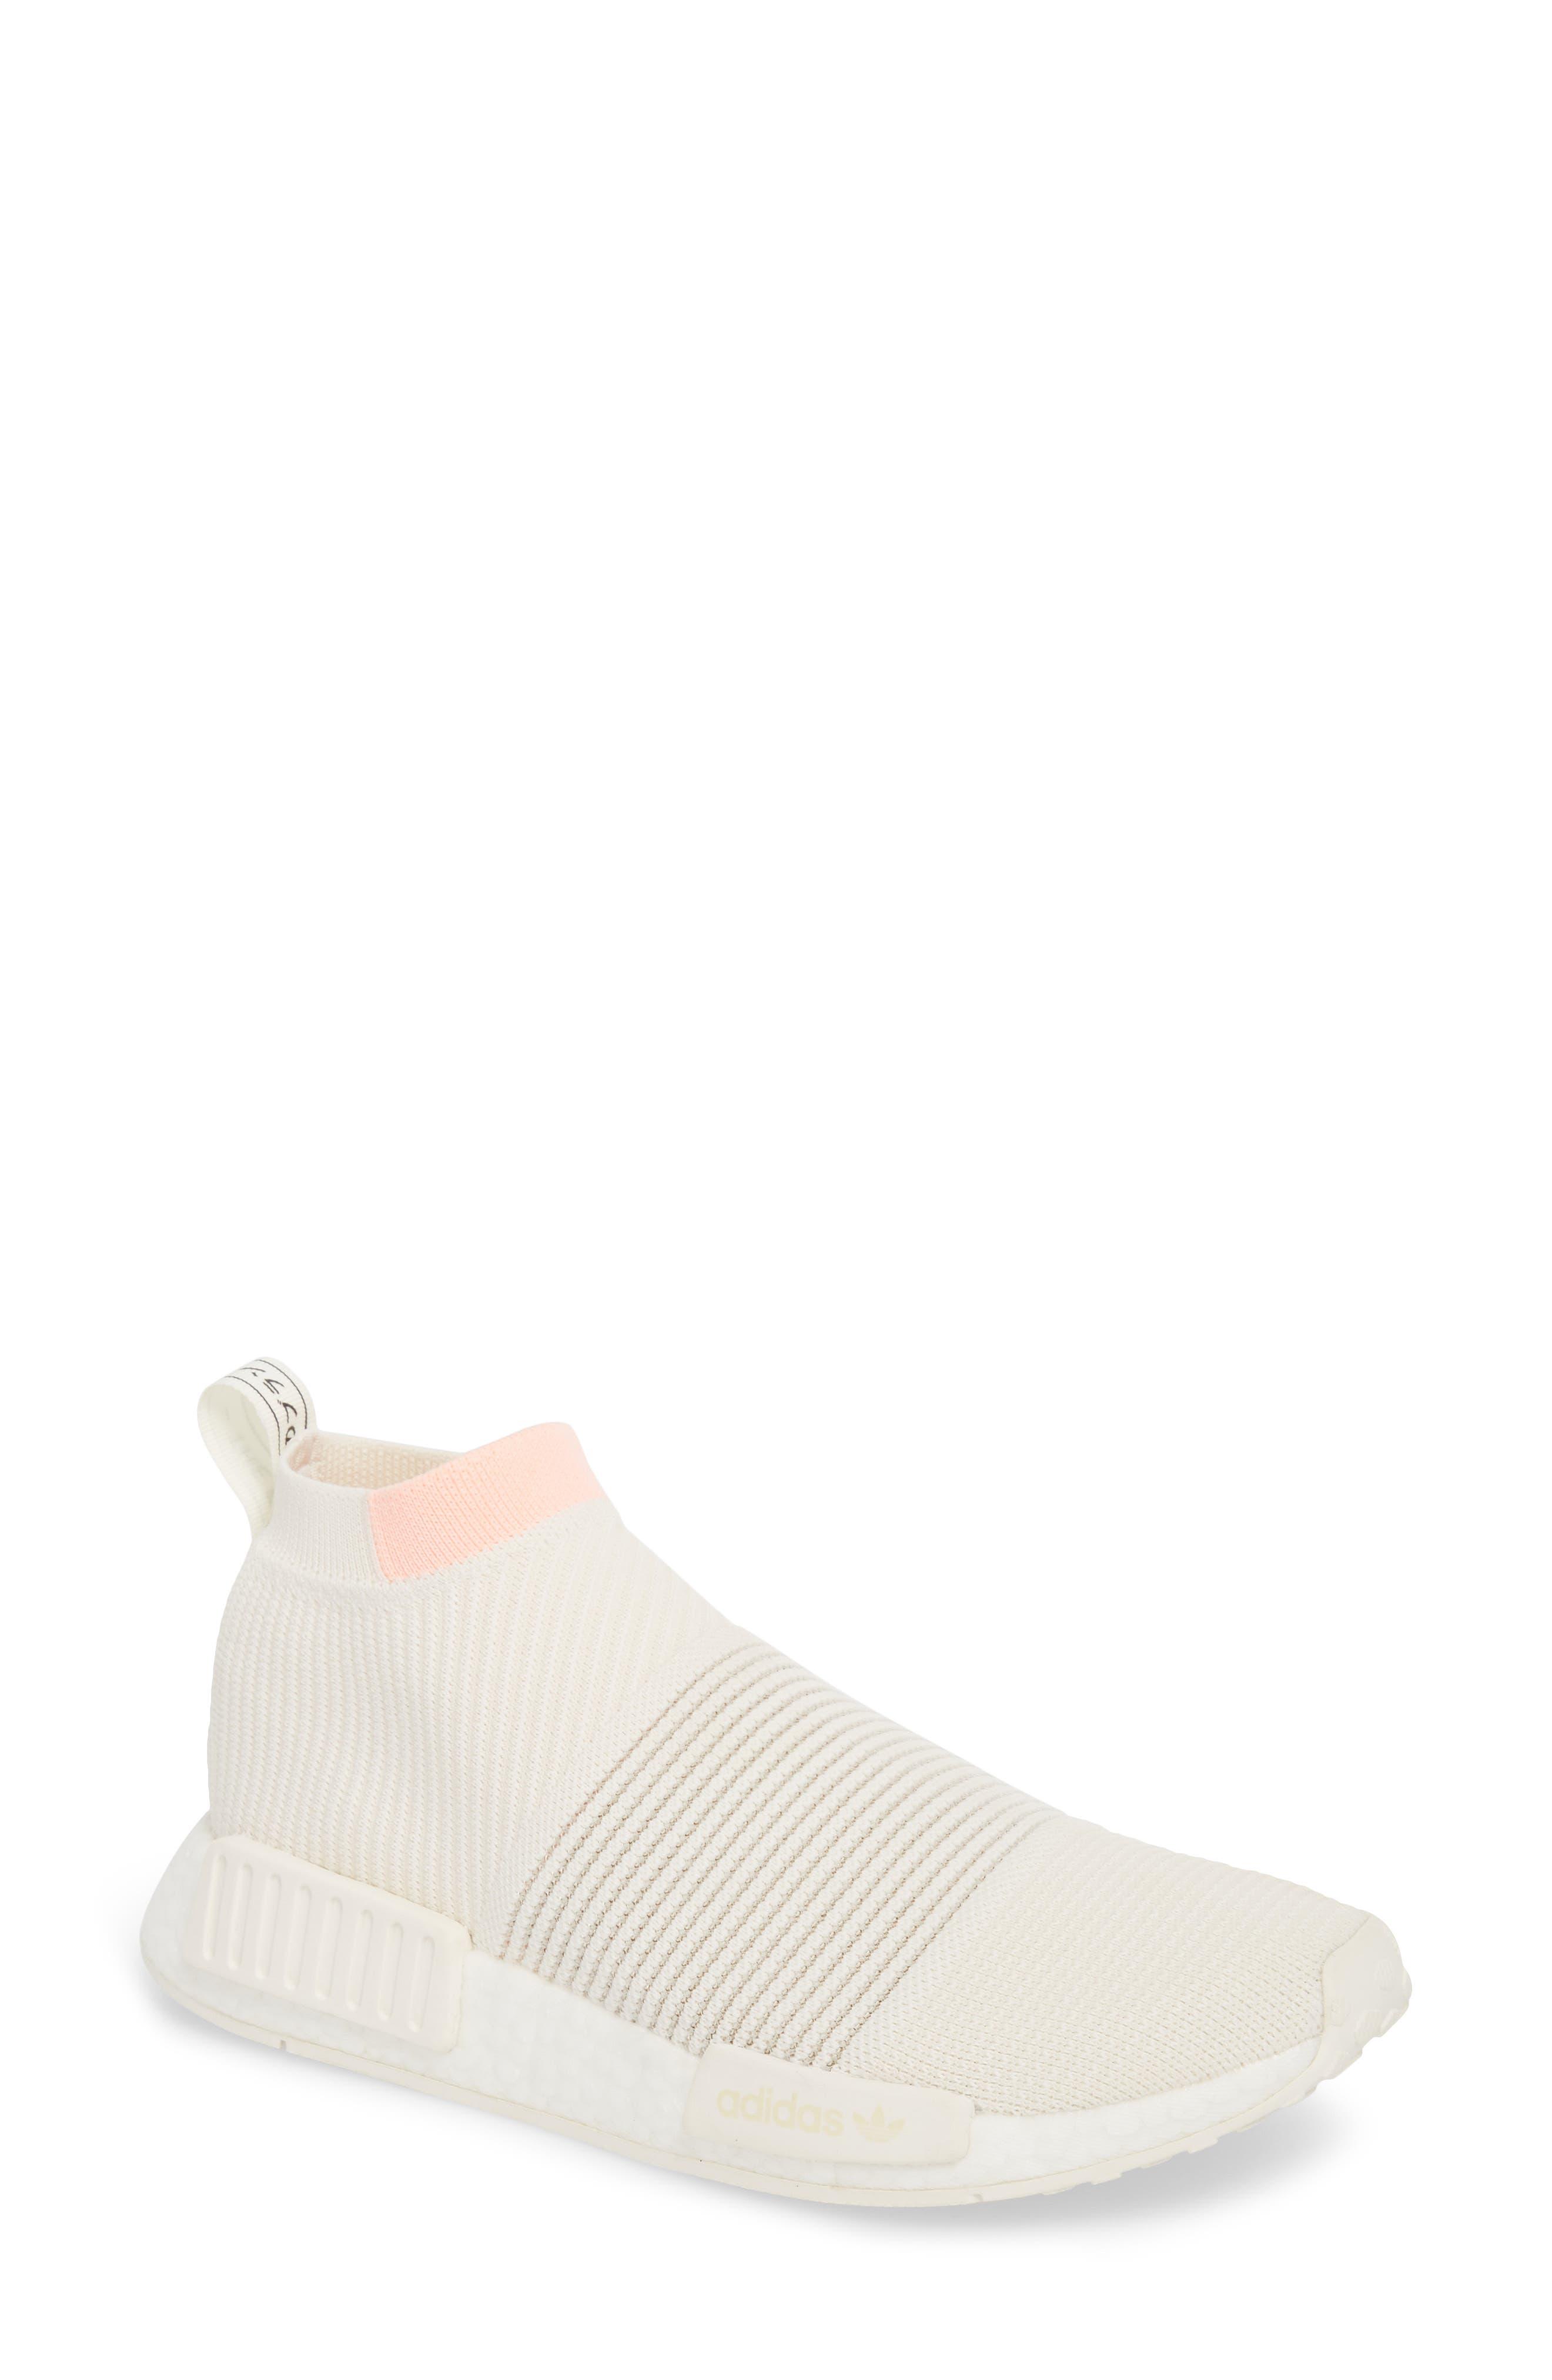 NMD_CS1 Primeknit Sneaker,                             Main thumbnail 1, color,                             CLOUD WHITE/ CLEAR ORANGE